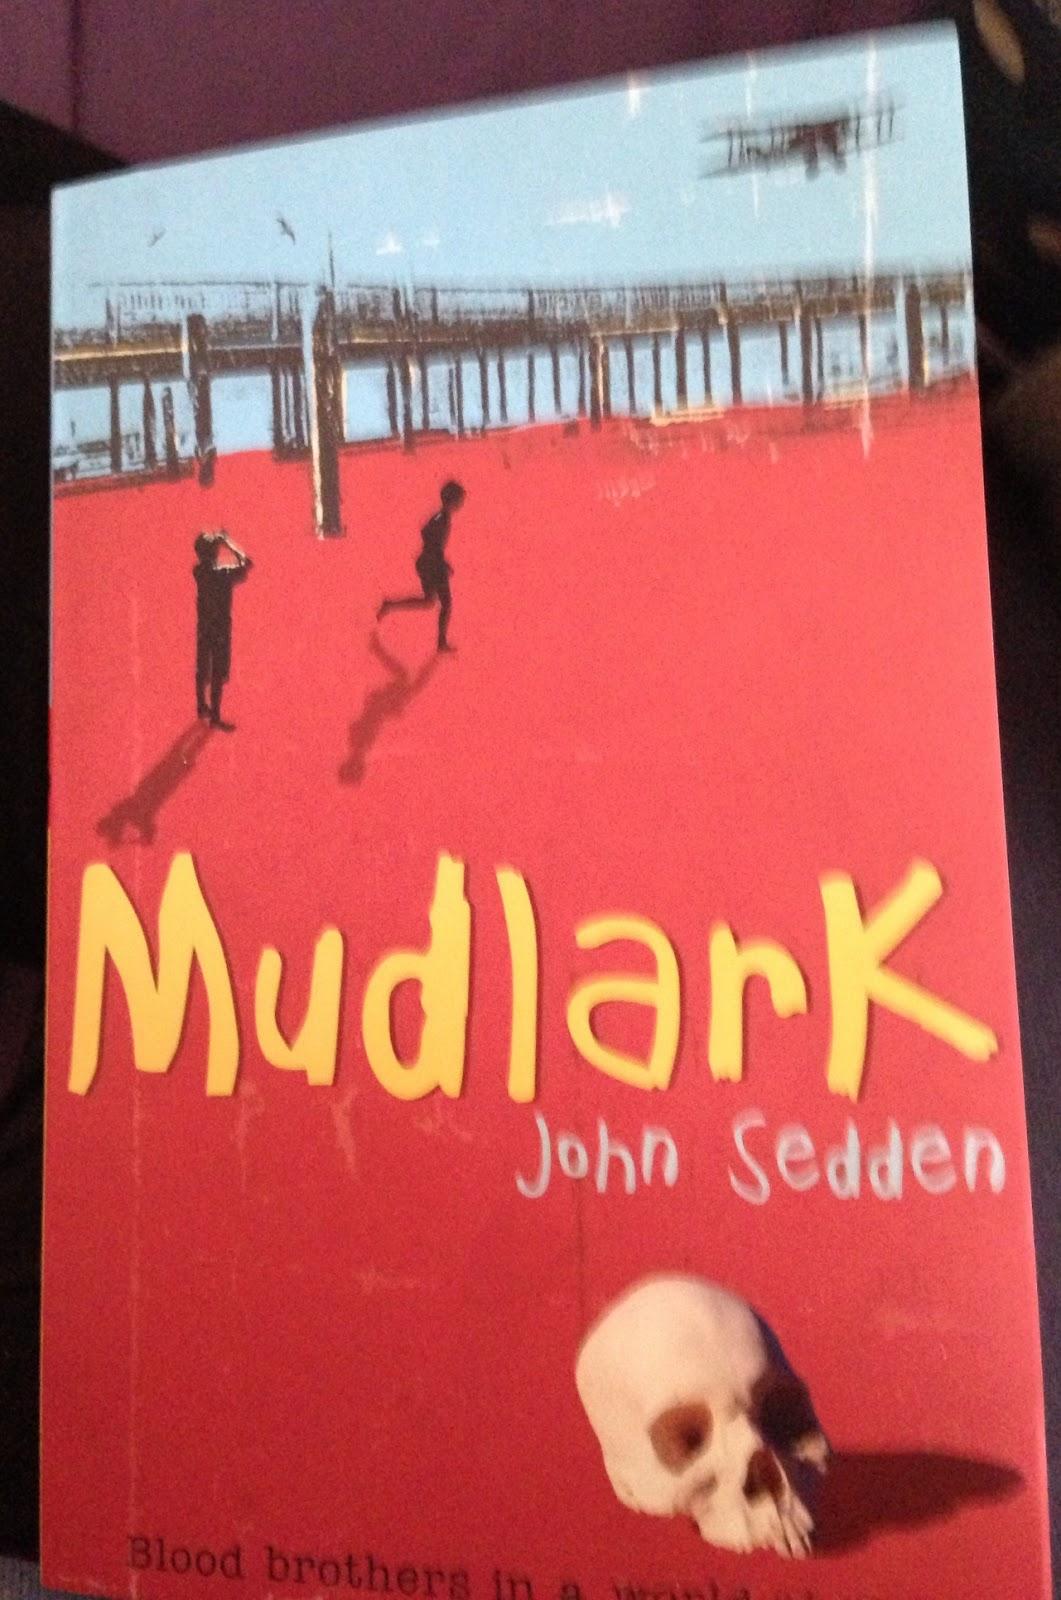 Mudlarks postmortem pictures